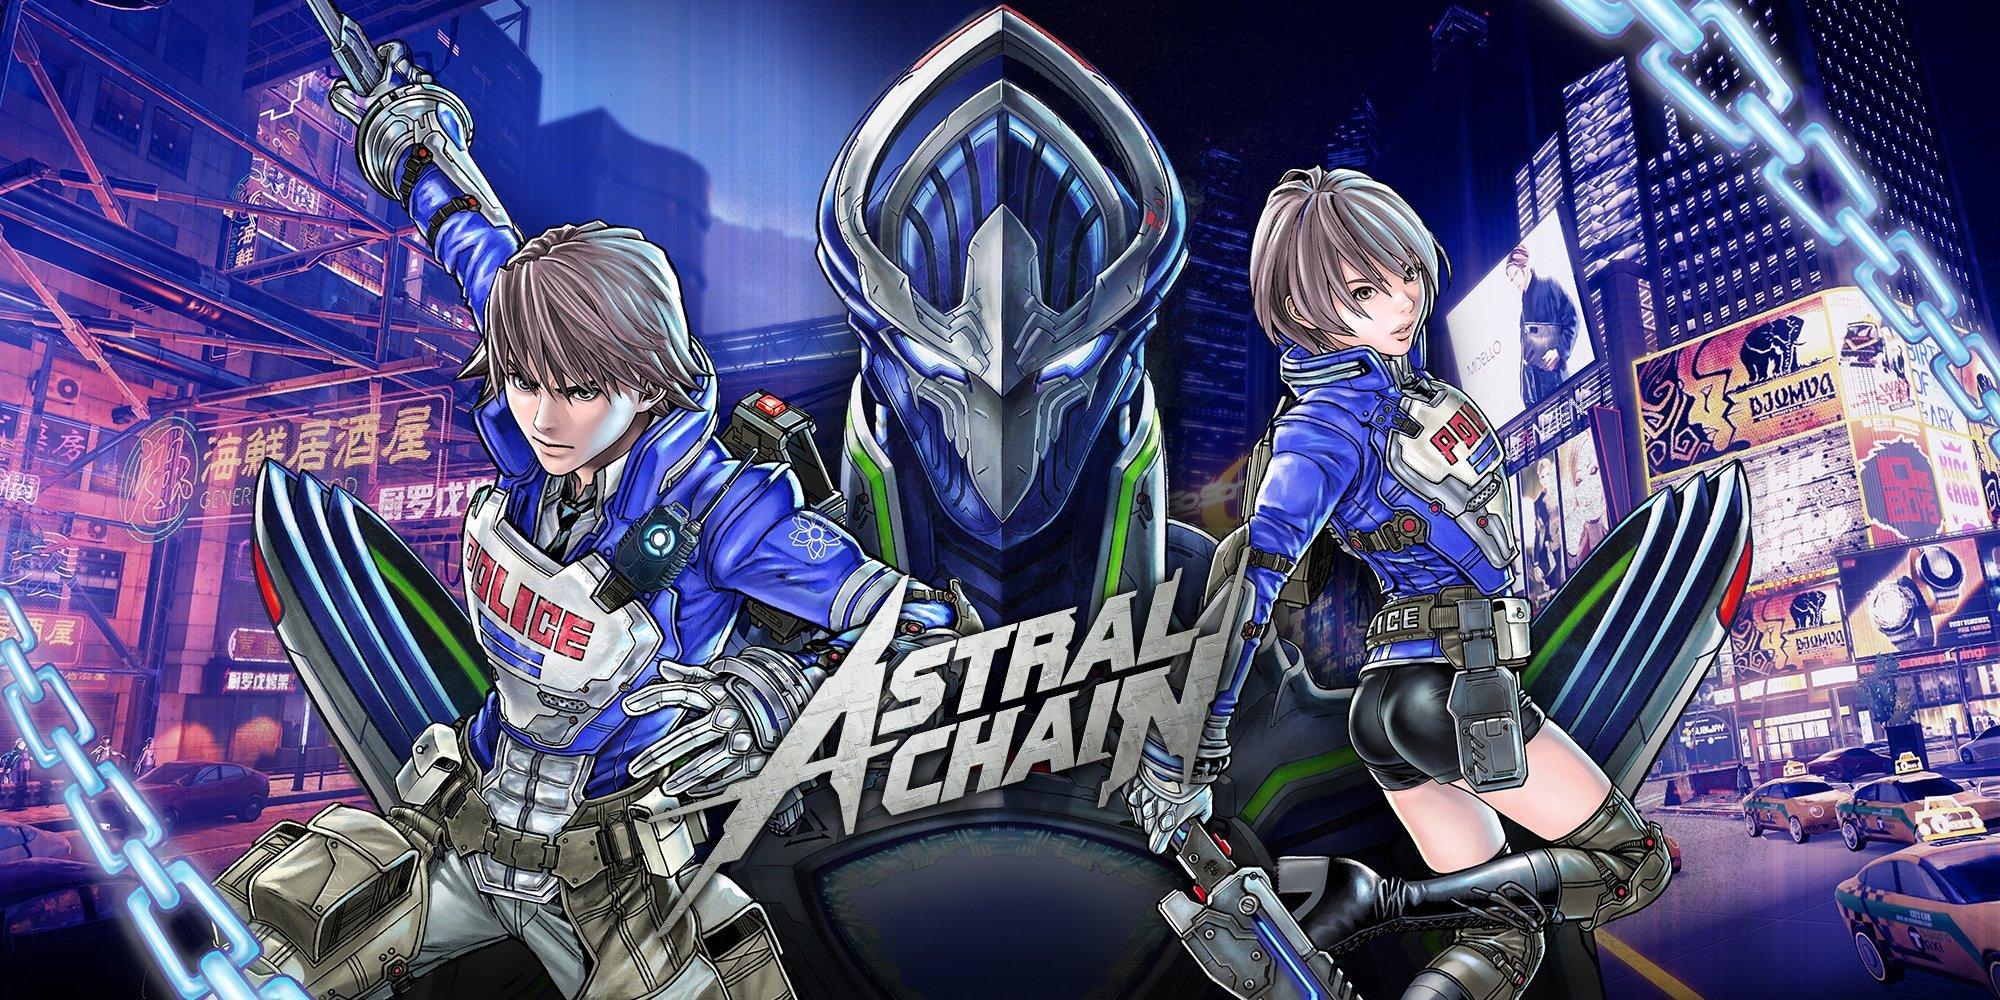 From Astral Chain To Zetman The Story Of Masakazu Katsura